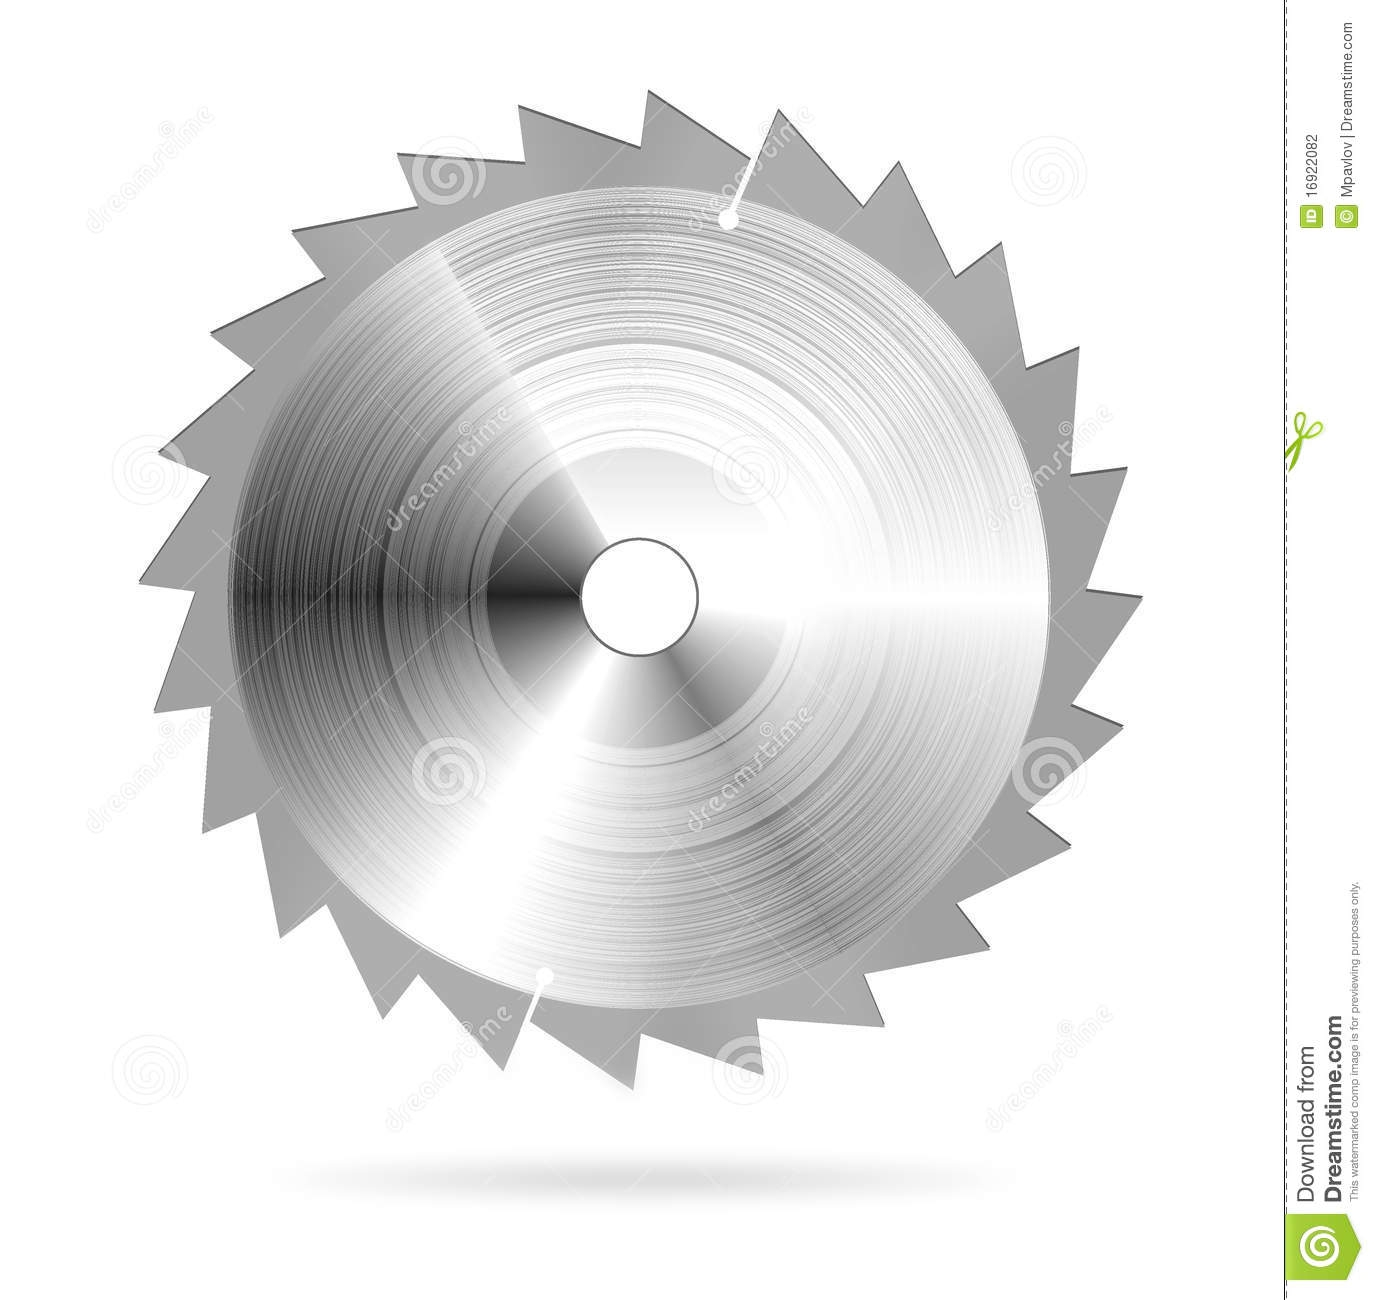 Circular Saw Blade Clipart#2040207.